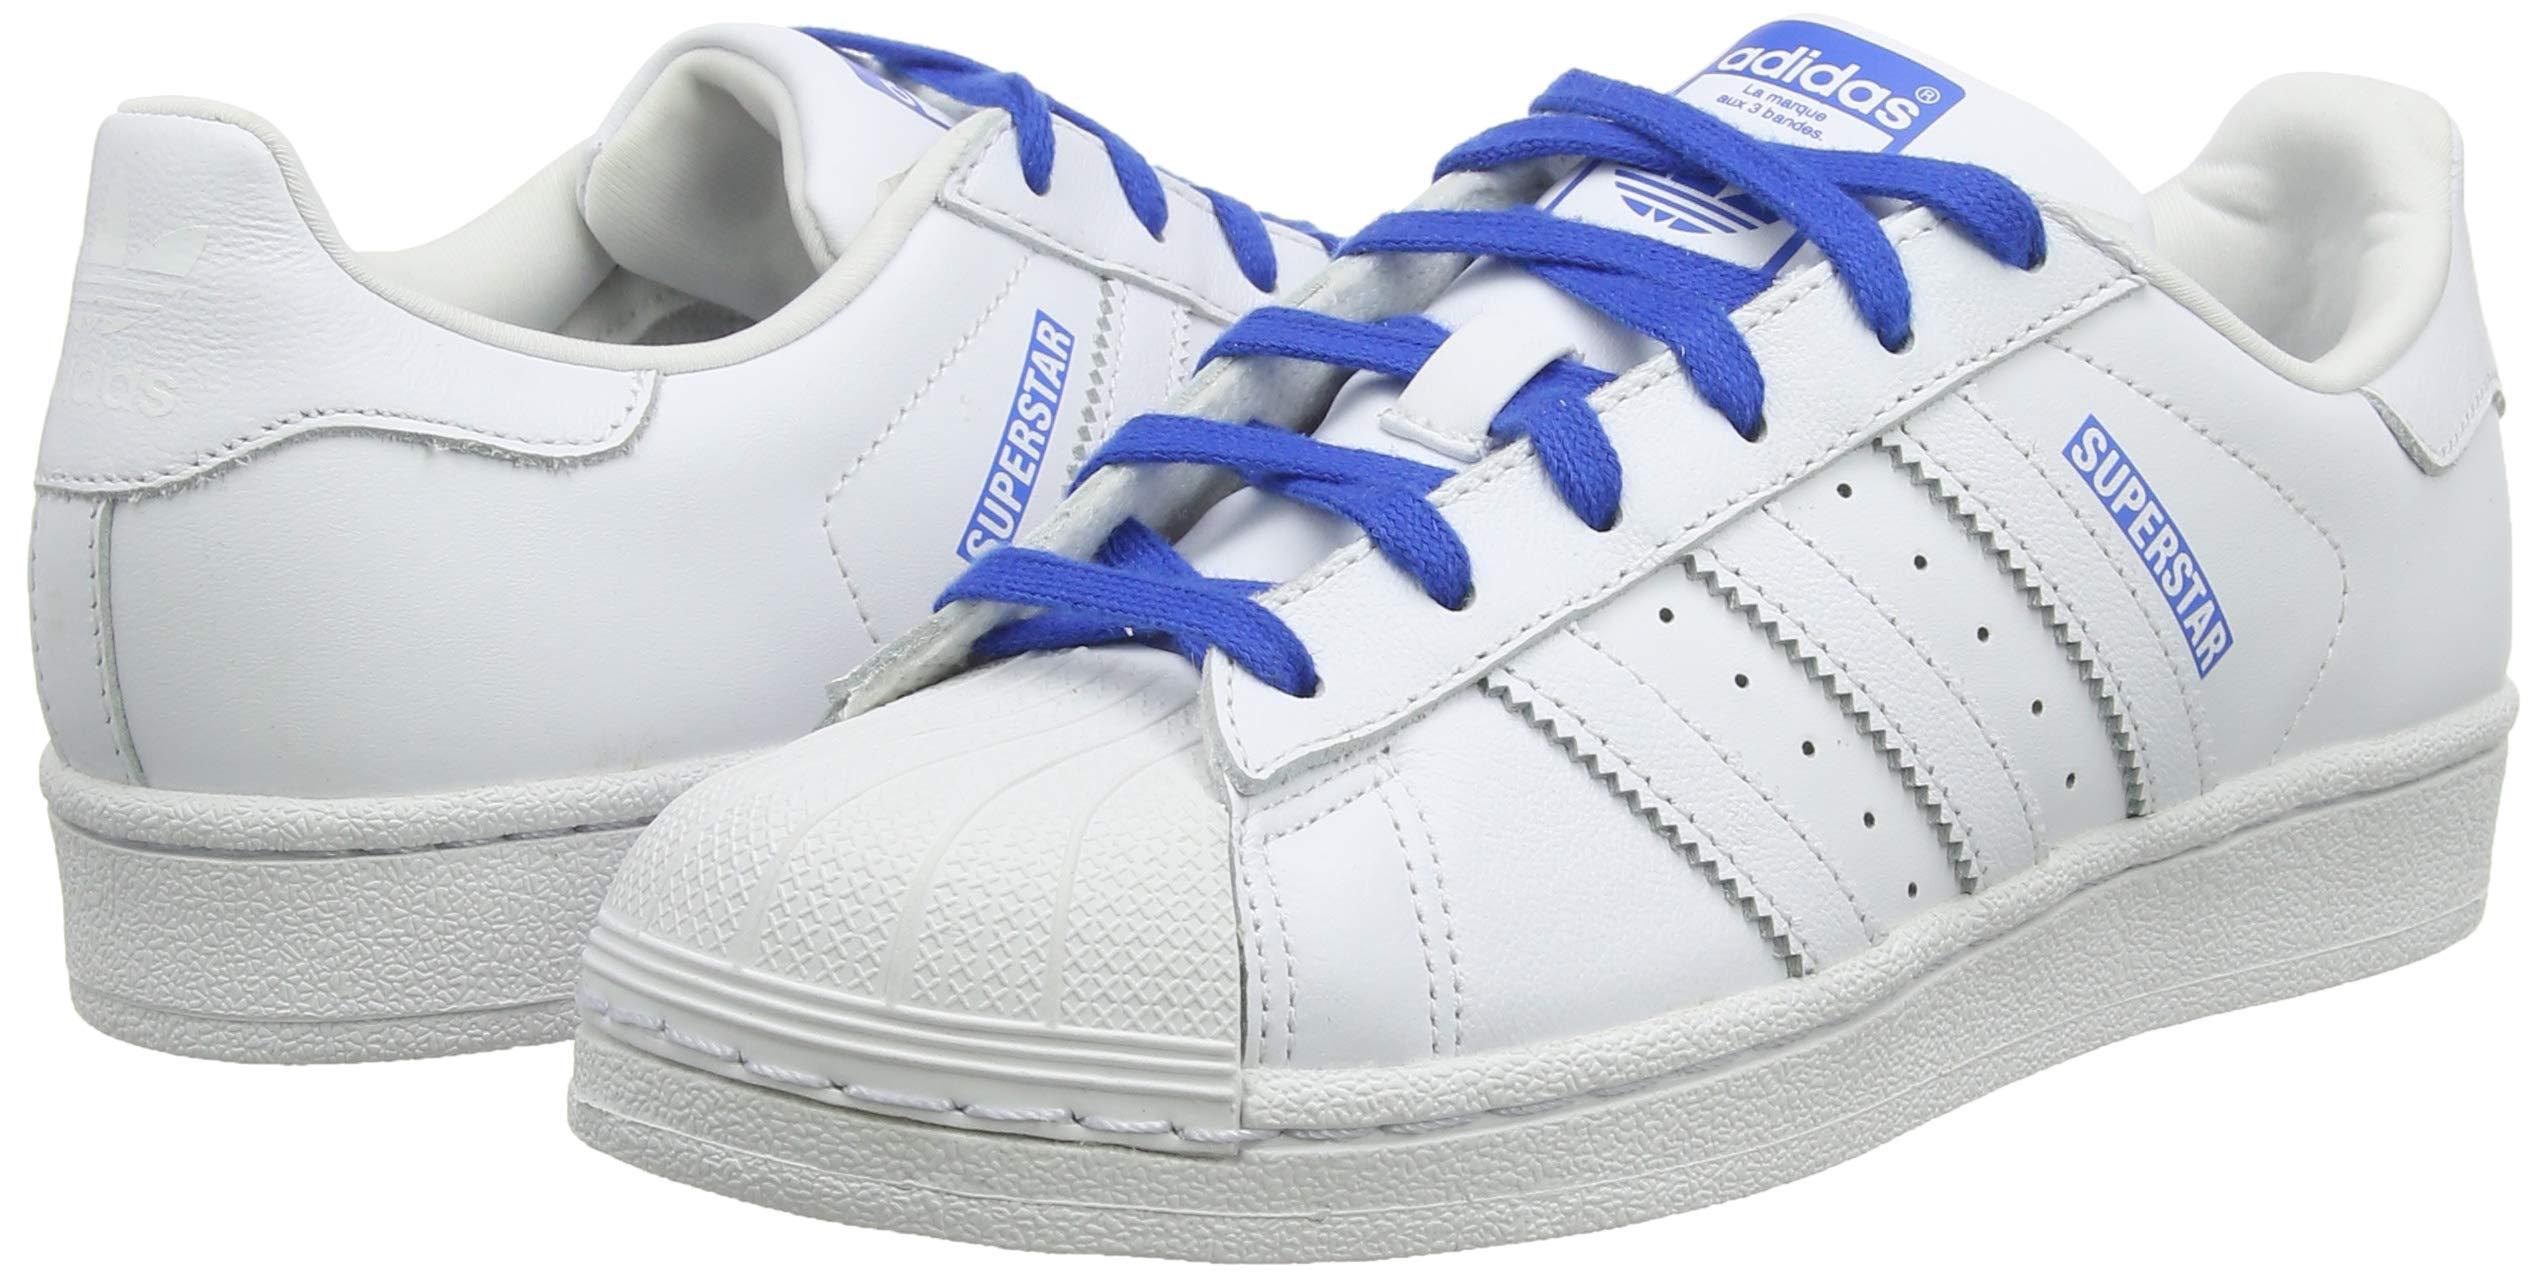 adidas Superstar J, Scarpe da Ginnastica Unisex-Bambini 10 spesavip